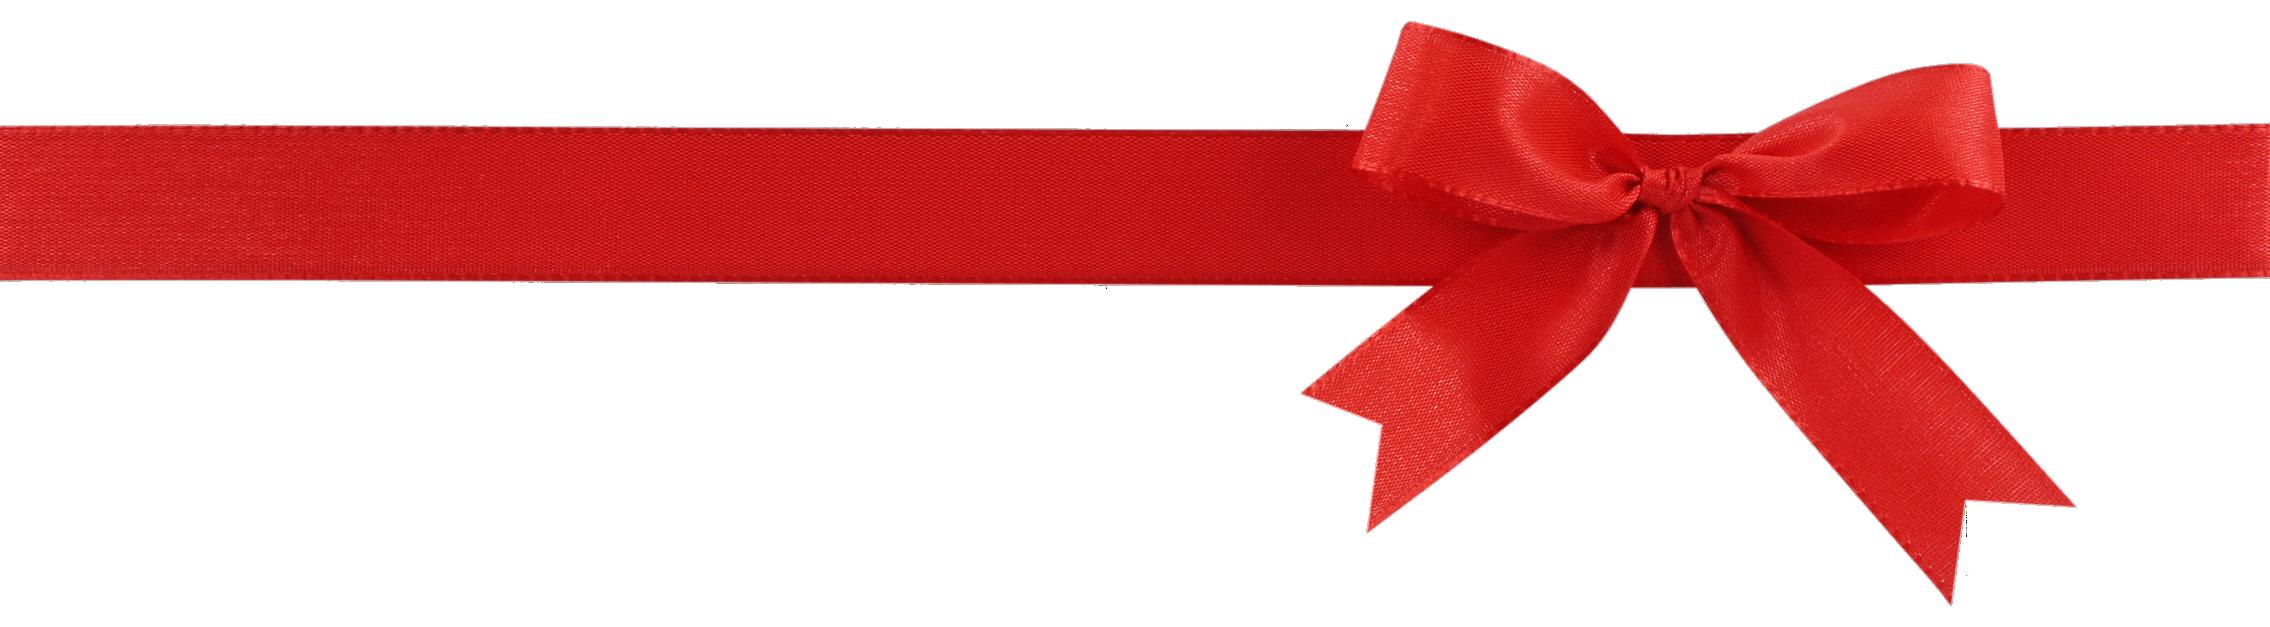 Gift Ribbon PNG Image - A Gift PNG